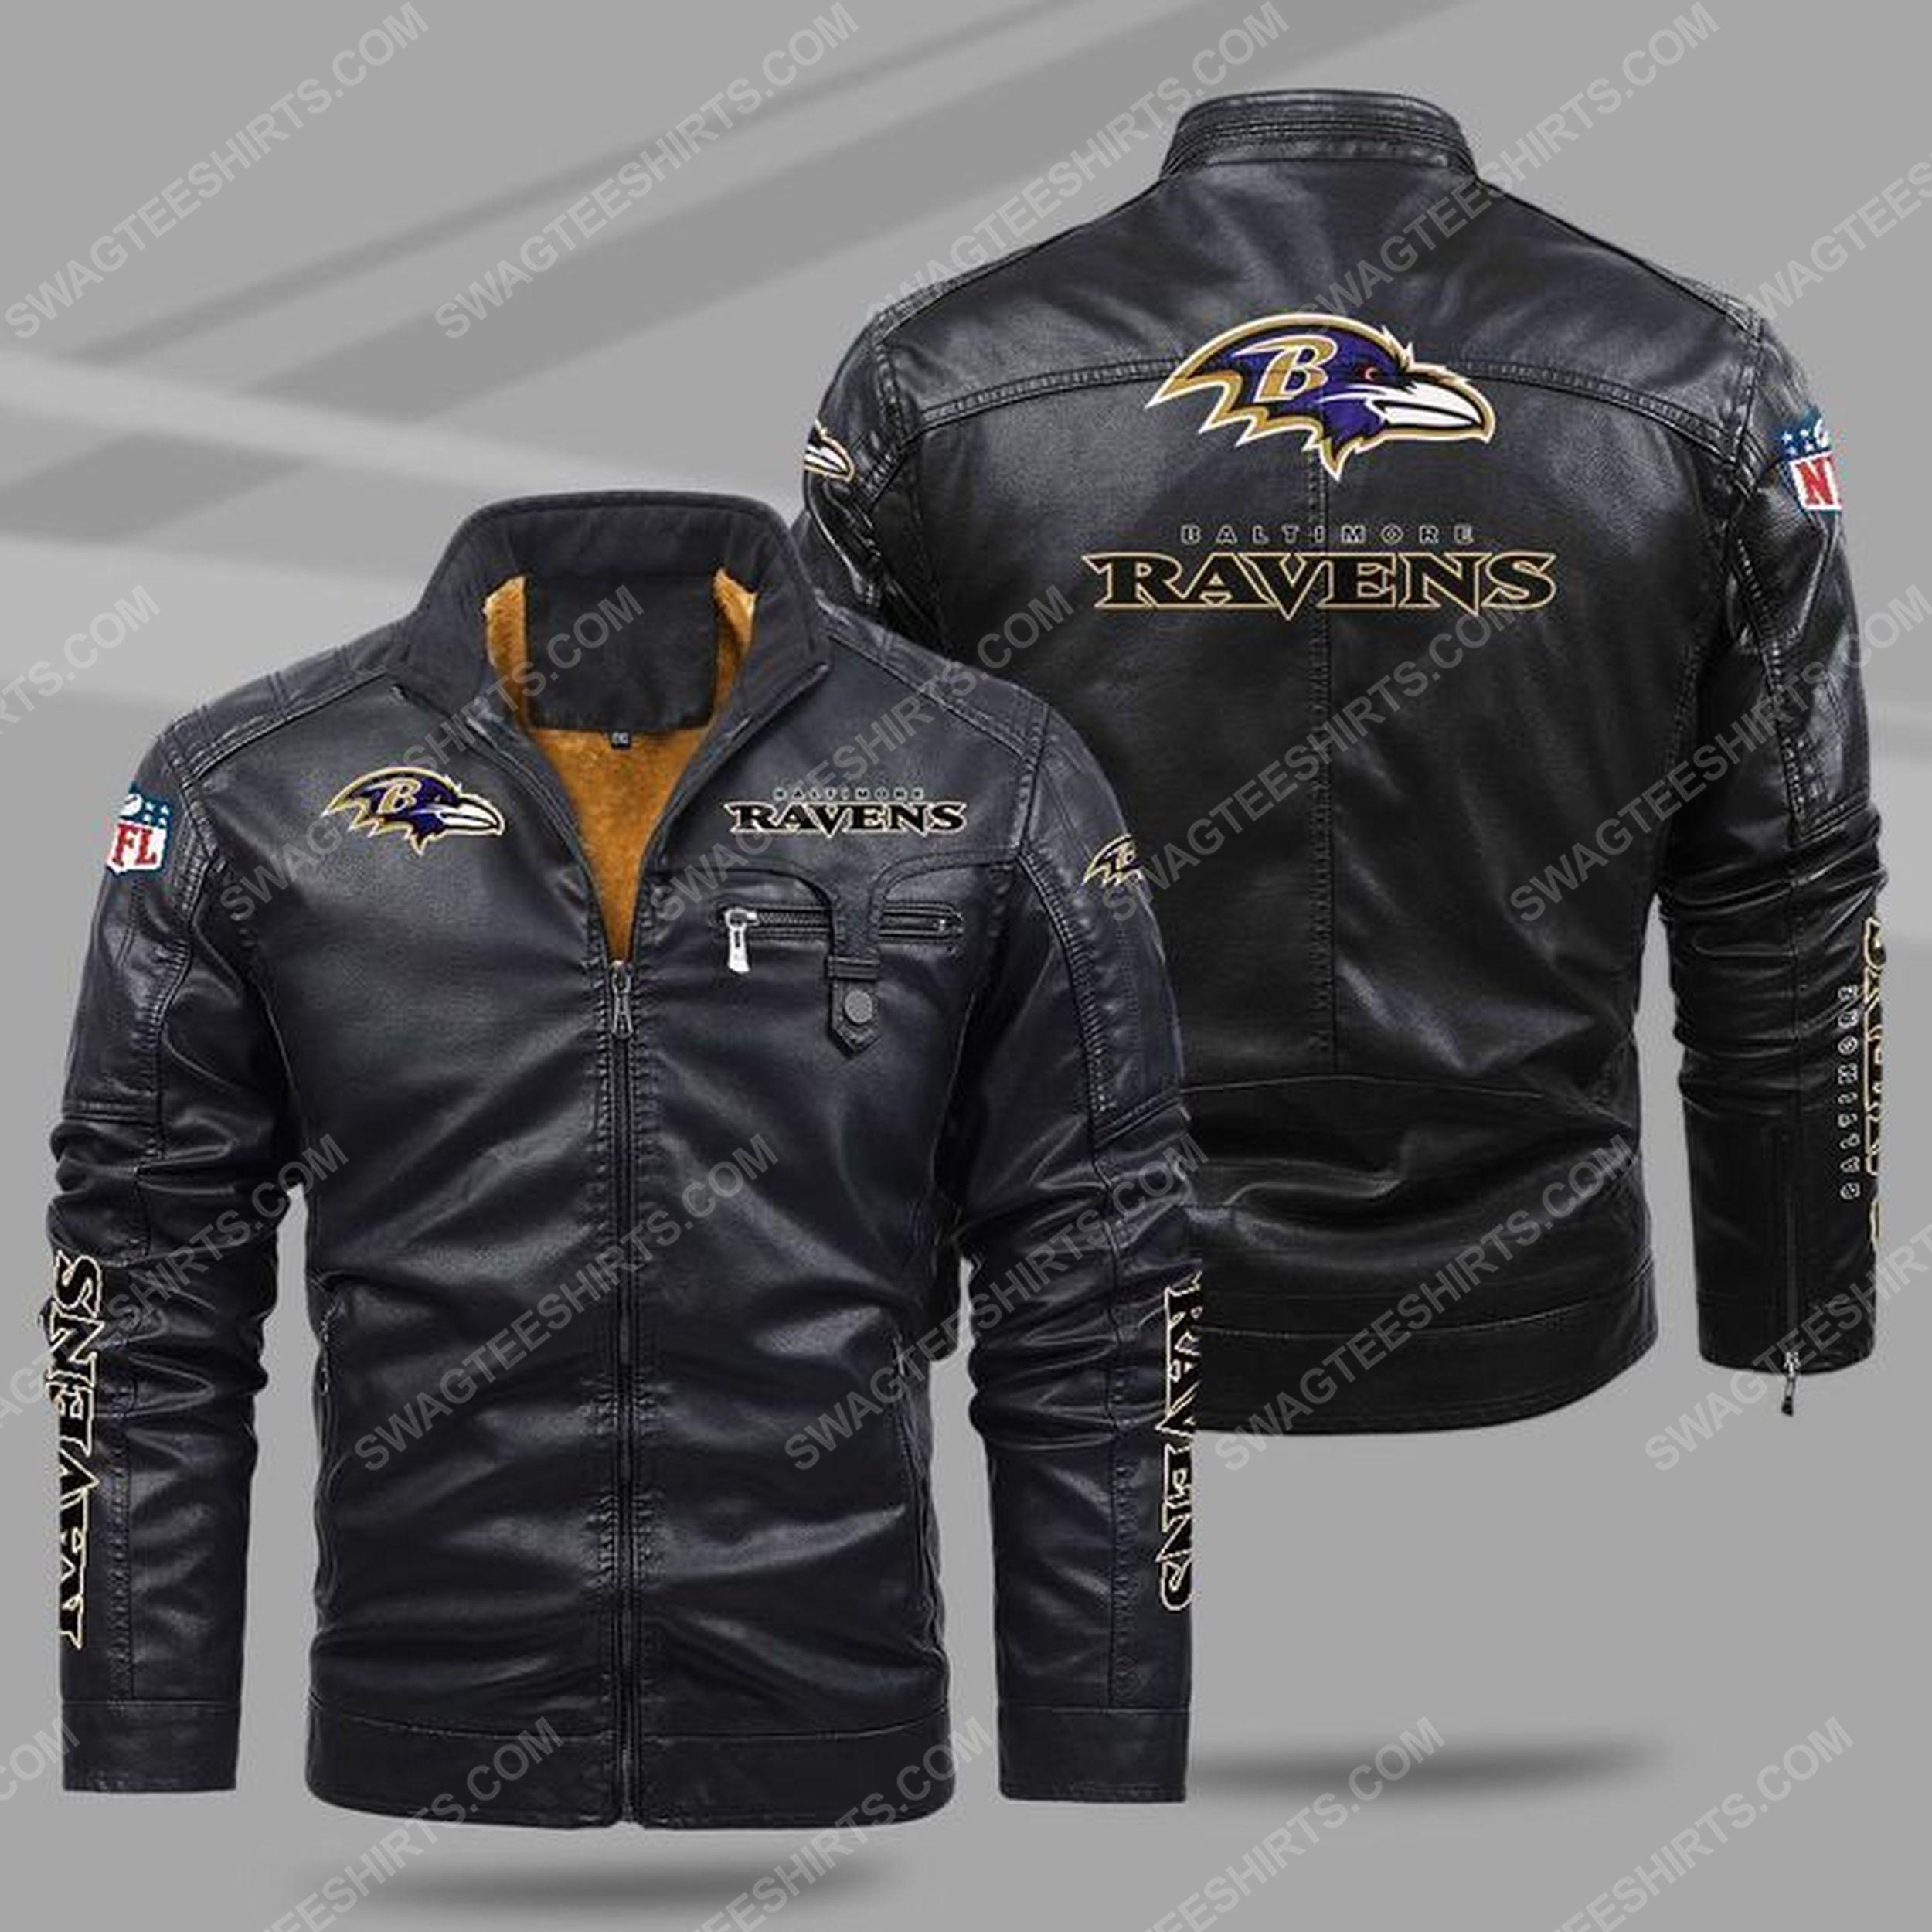 The baltimore ravens nfl all over print fleece leather jacket - black 1 - Copy